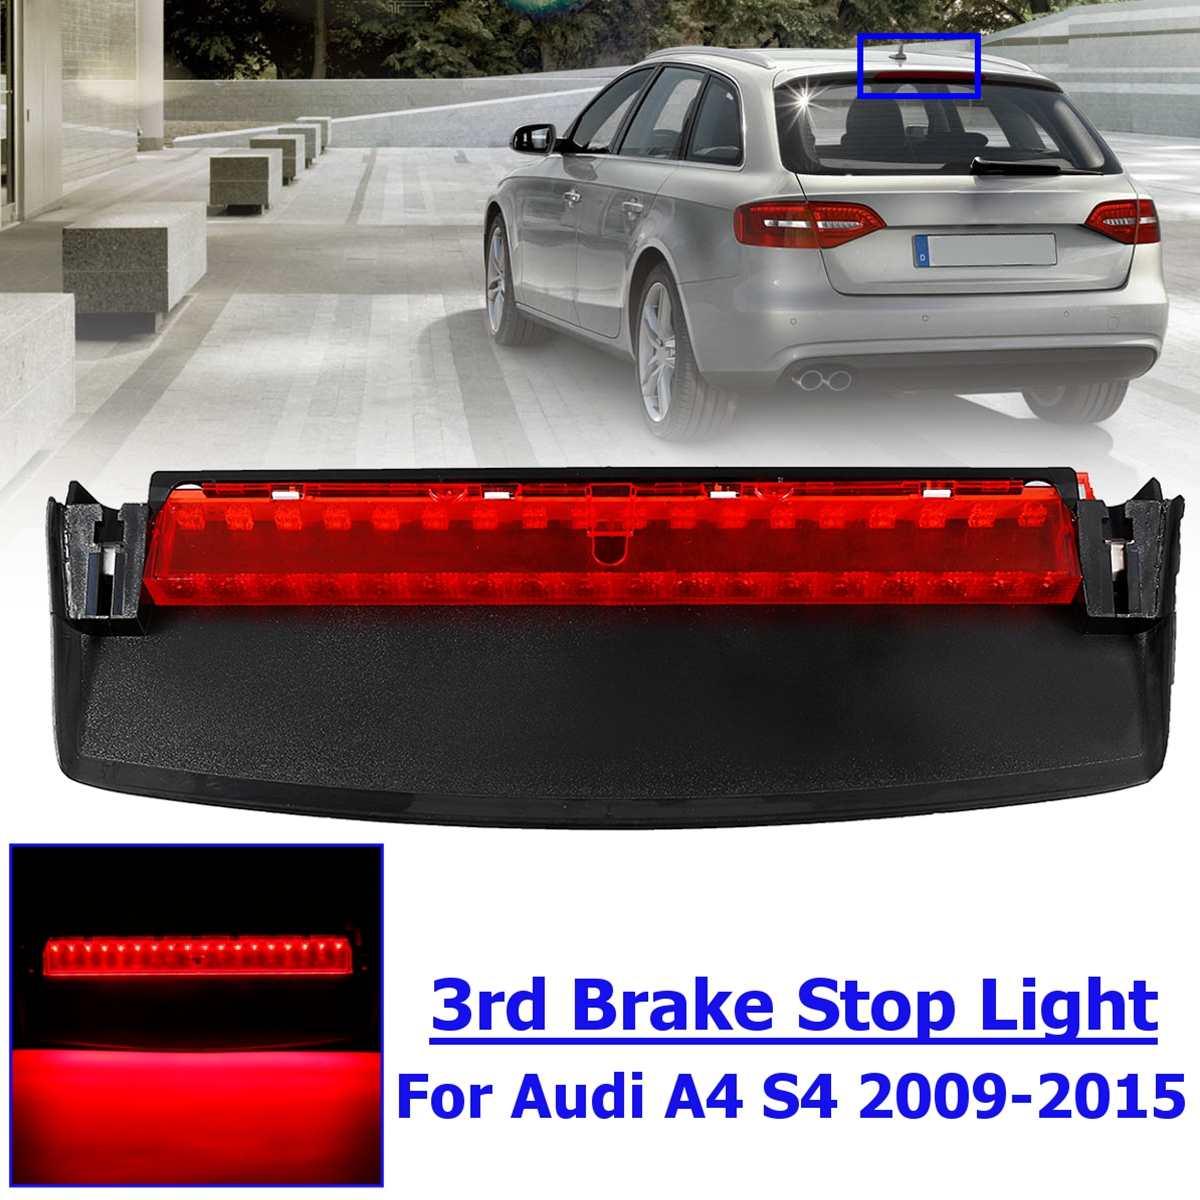 For Audi A4 Quattro S4 2009 2010 2011 2012 2013 2014 2015 8K5945097 Rear LED Third High Brake Mount Stop Lamp Light